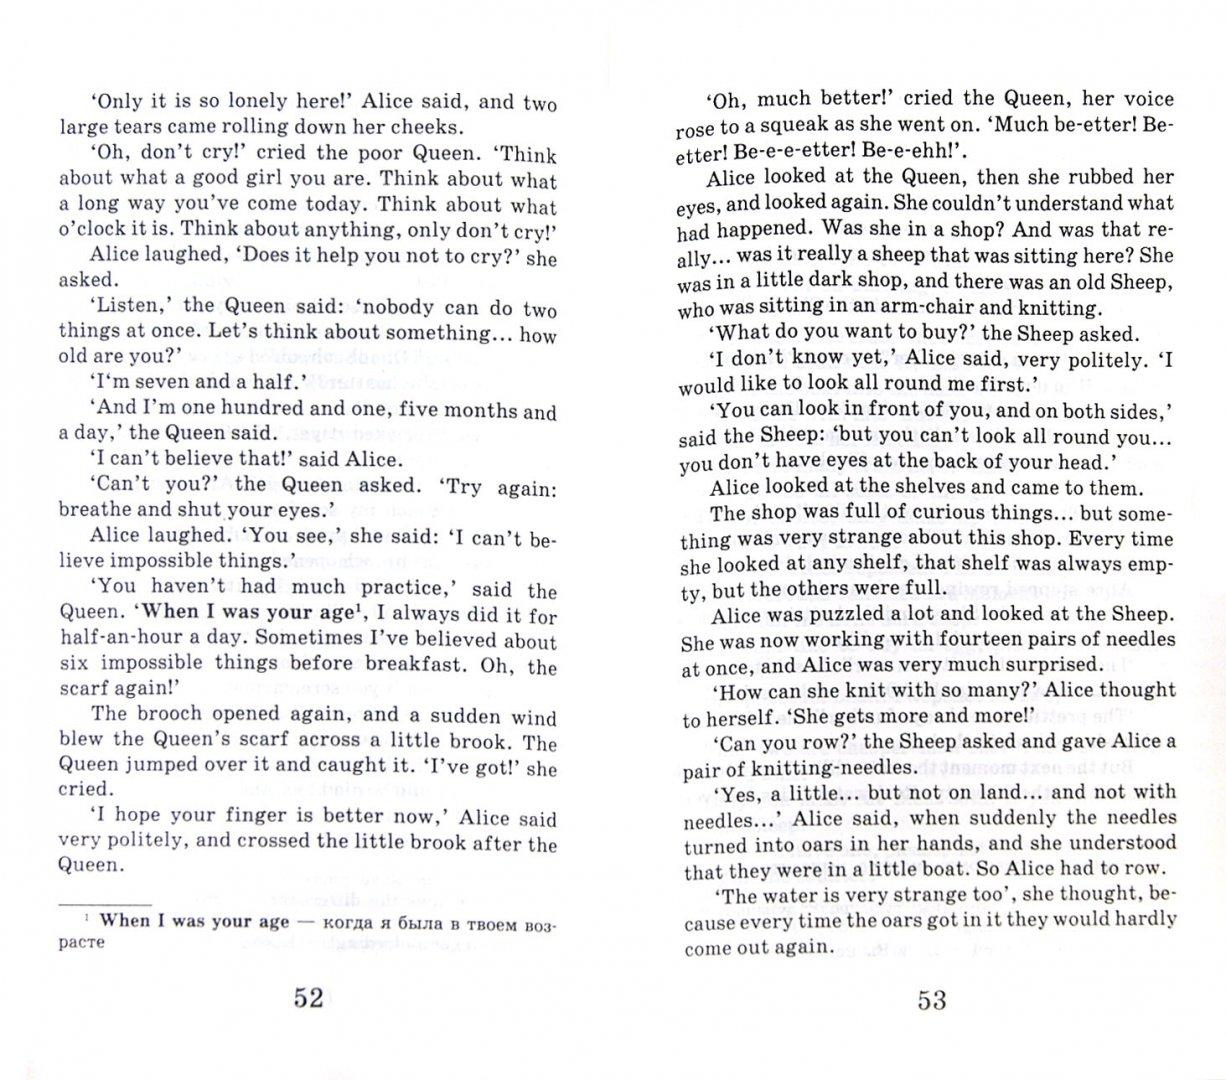 Иллюстрация 1 из 6 для Алиса в зазеркалье = Through the Looking-Glass, and What Alice Found There - Льюис Кэрролл | Лабиринт - книги. Источник: Лабиринт